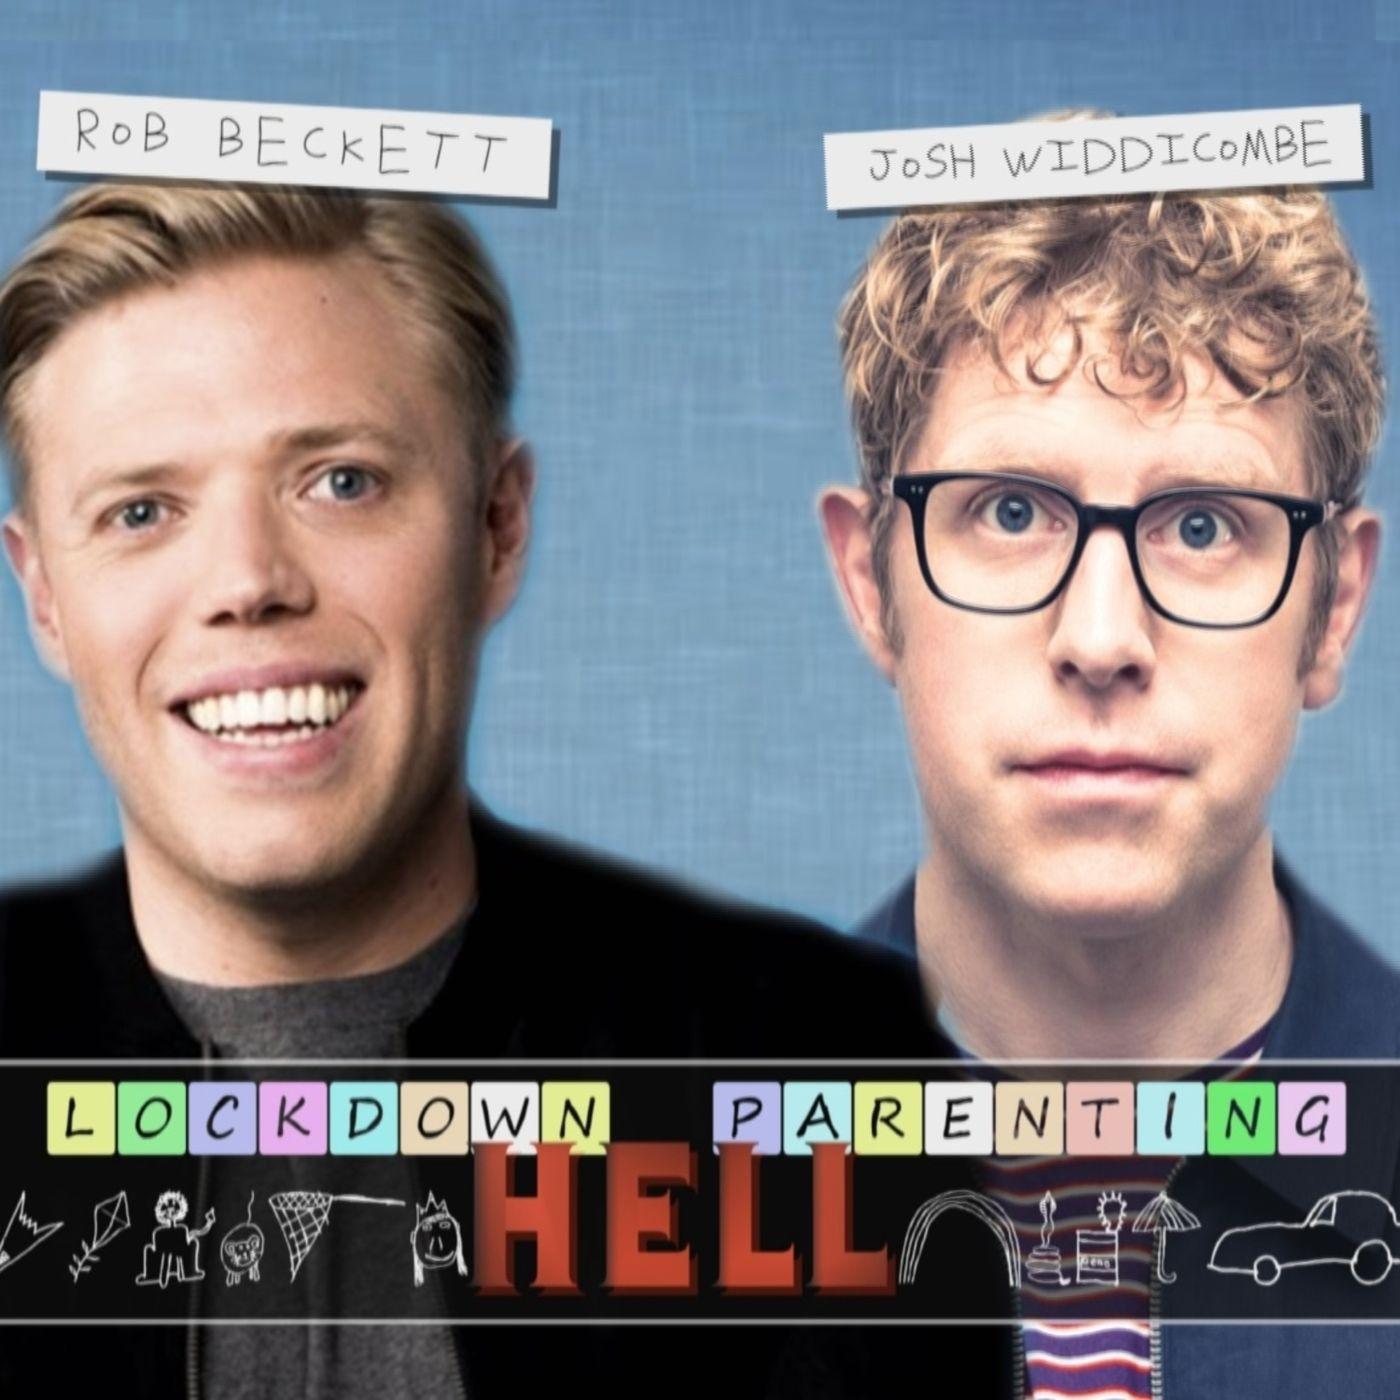 Rob Beckett and Josh Widdicombe's Lockdown Parenting Hell